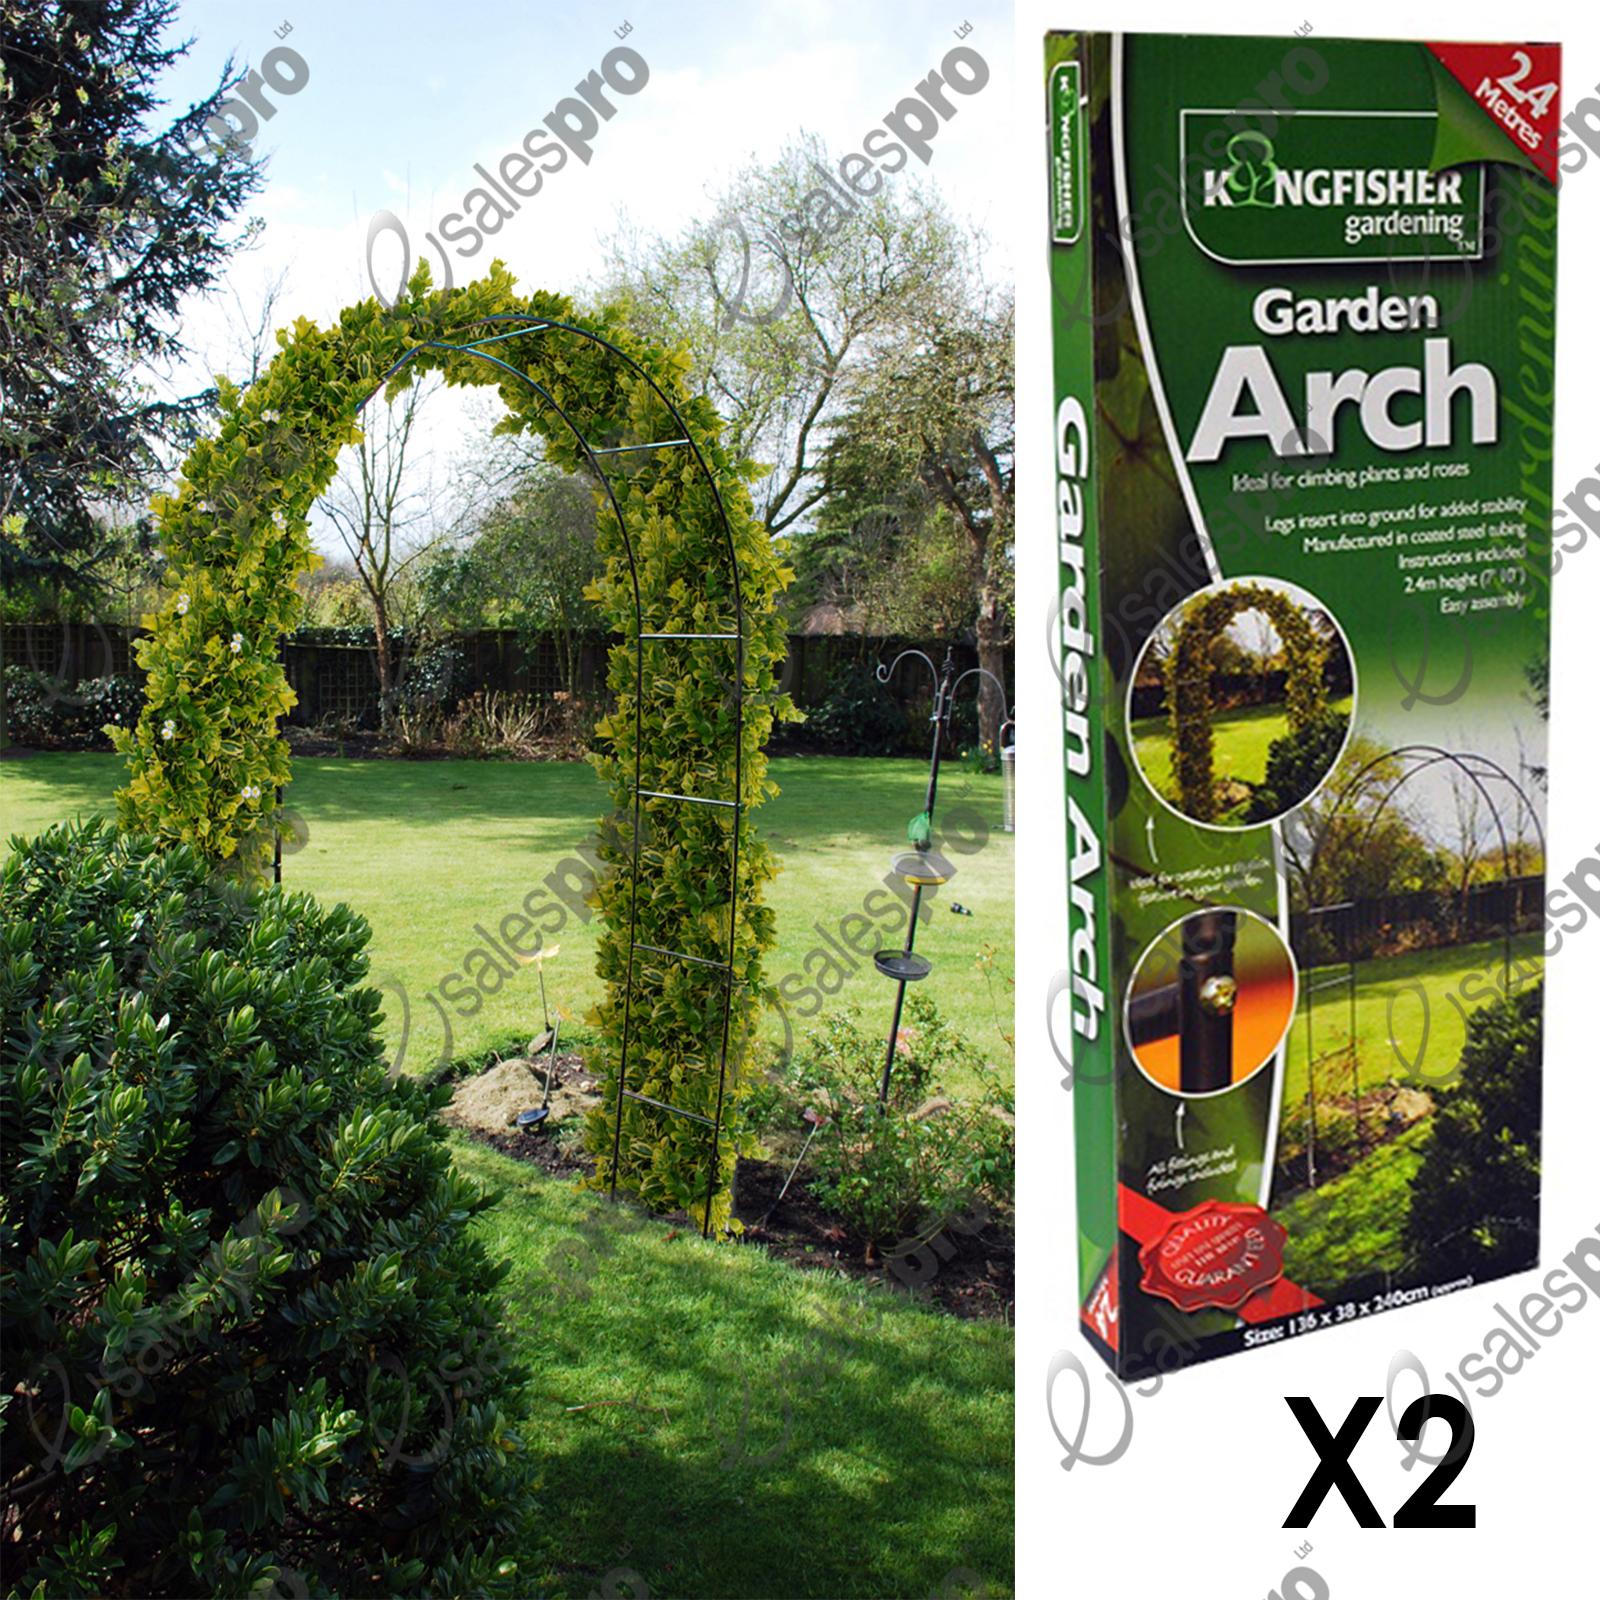 Garden arch trellis feature climbing plant roses 1